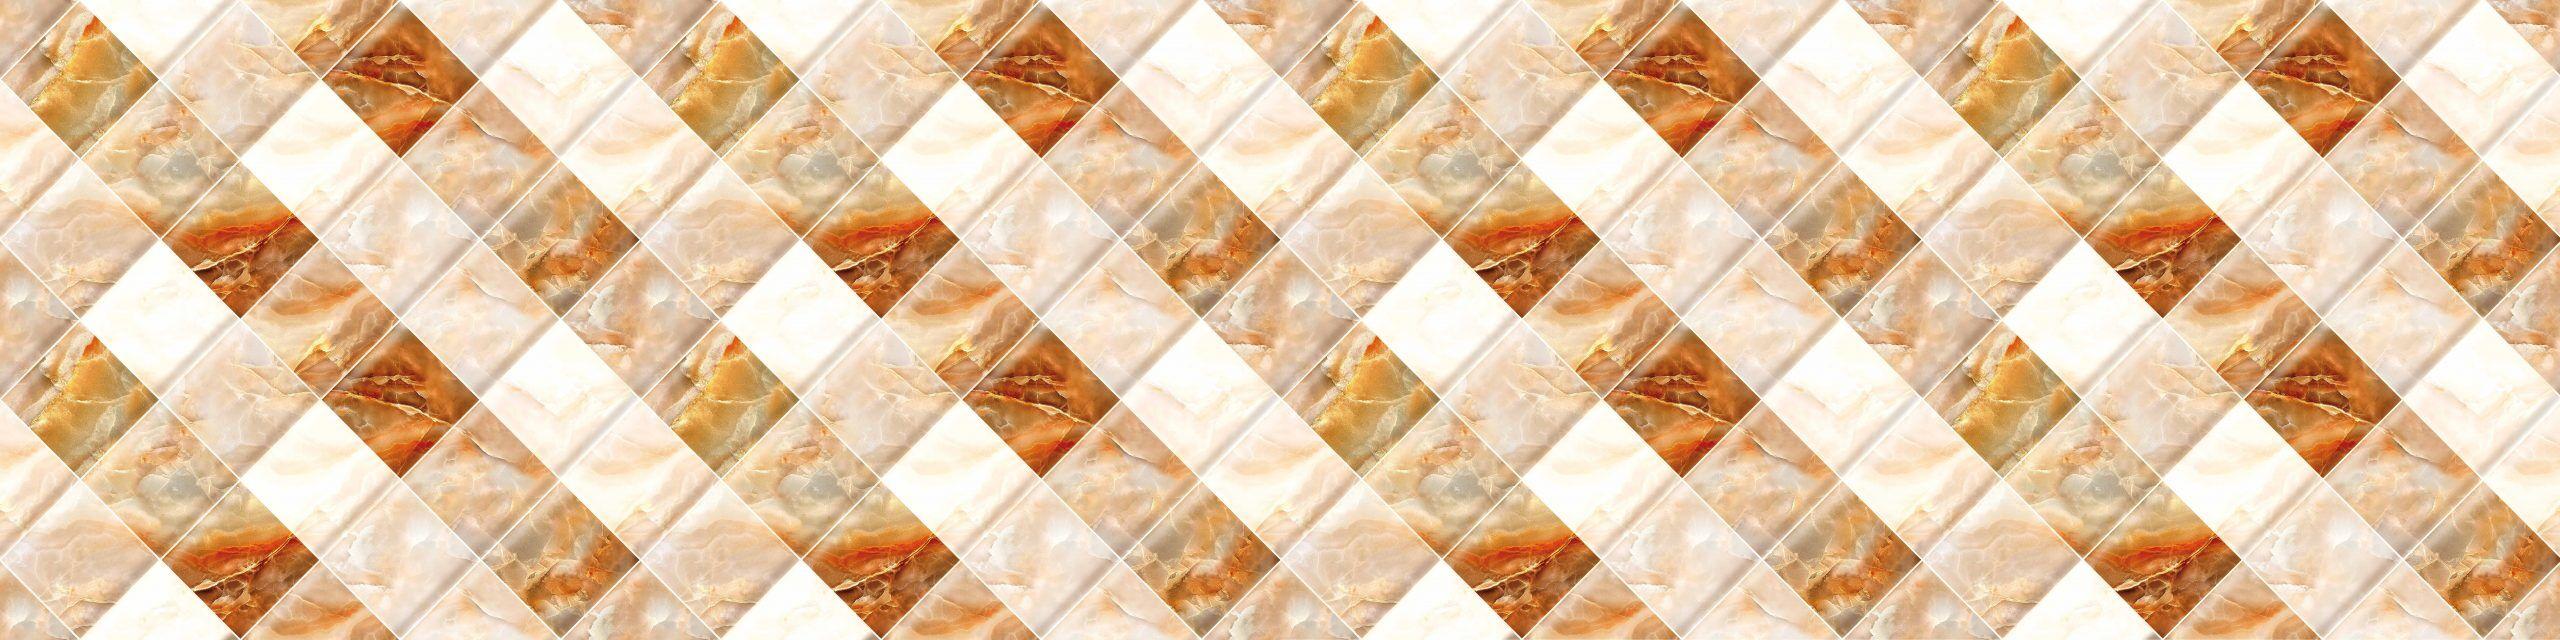 PlateART Küchenrückwand mit Motiv Marmor Beige Kacheln